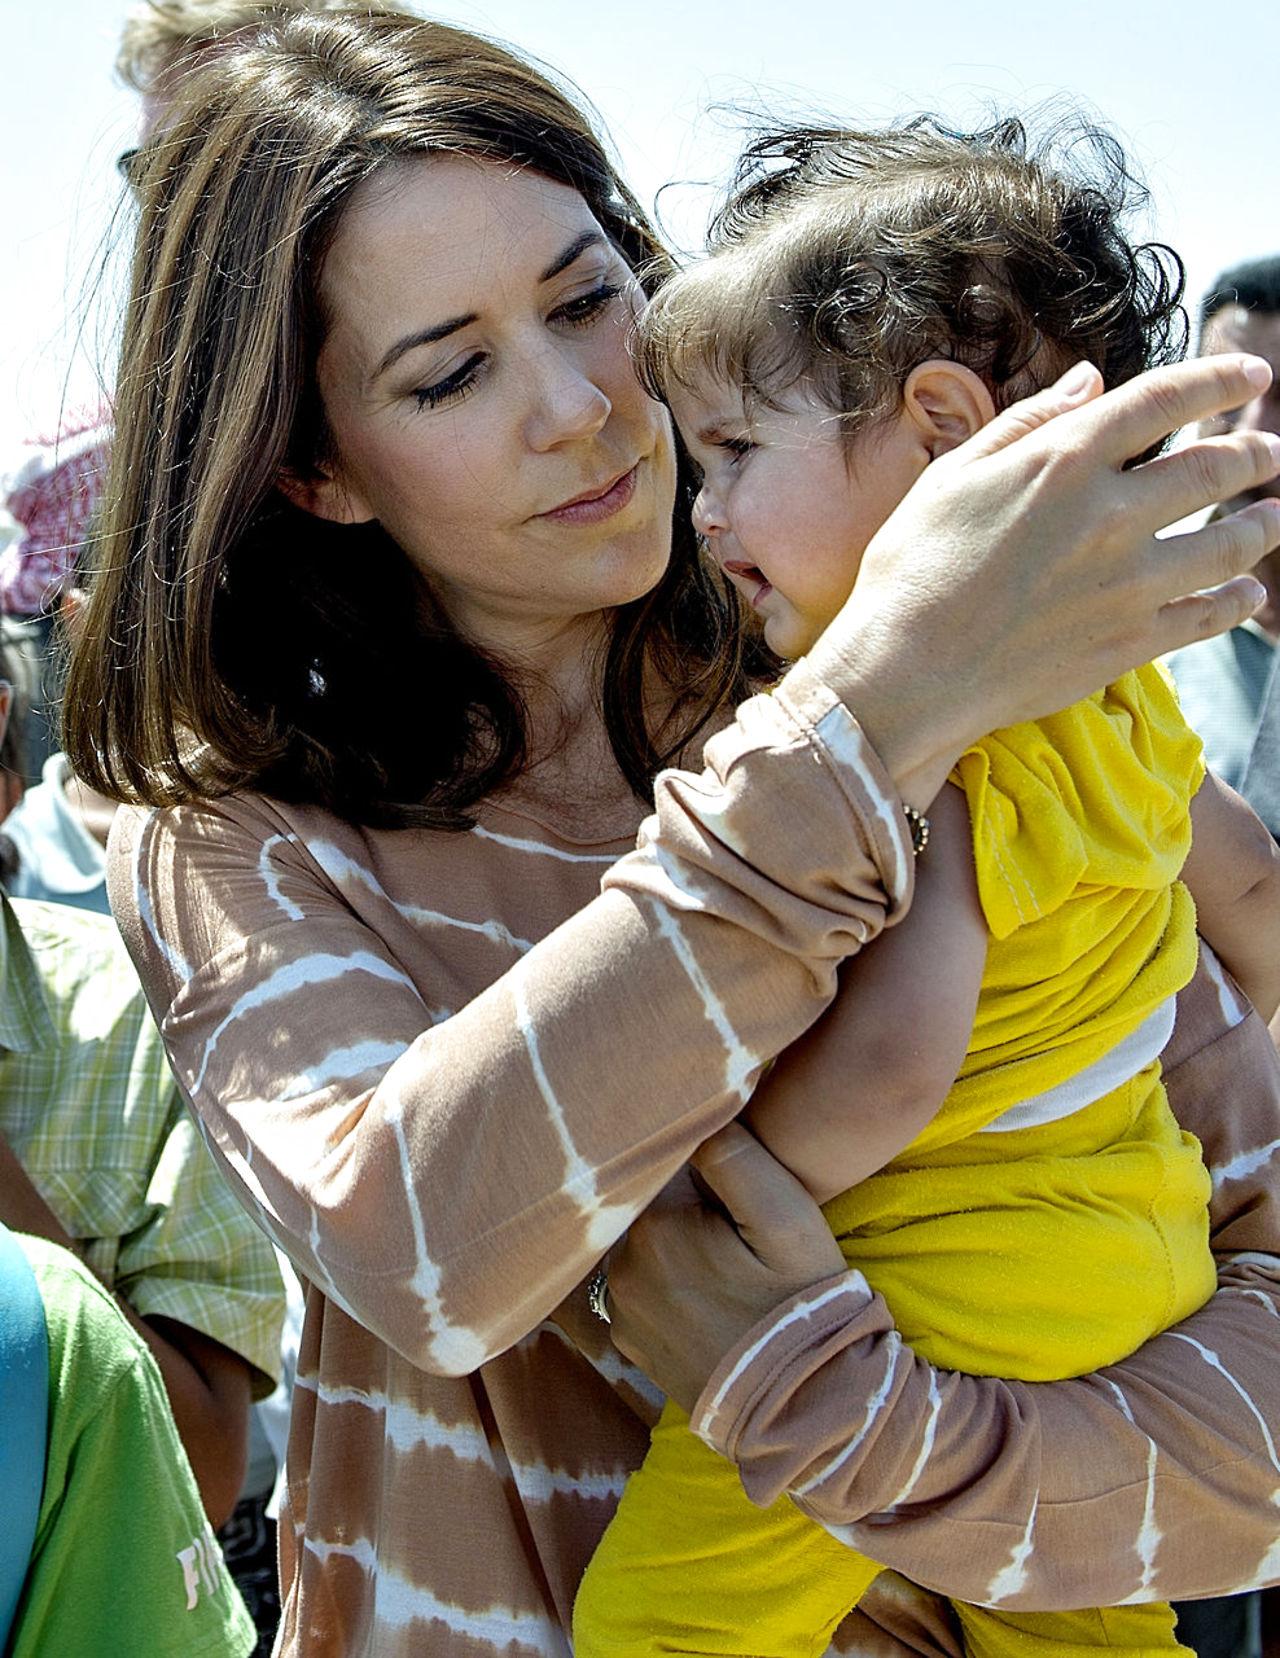 Mary y Frederik - Página 17 6738972-kronprinsesse-mary-besger-en-flygtningelejr-i-jordan